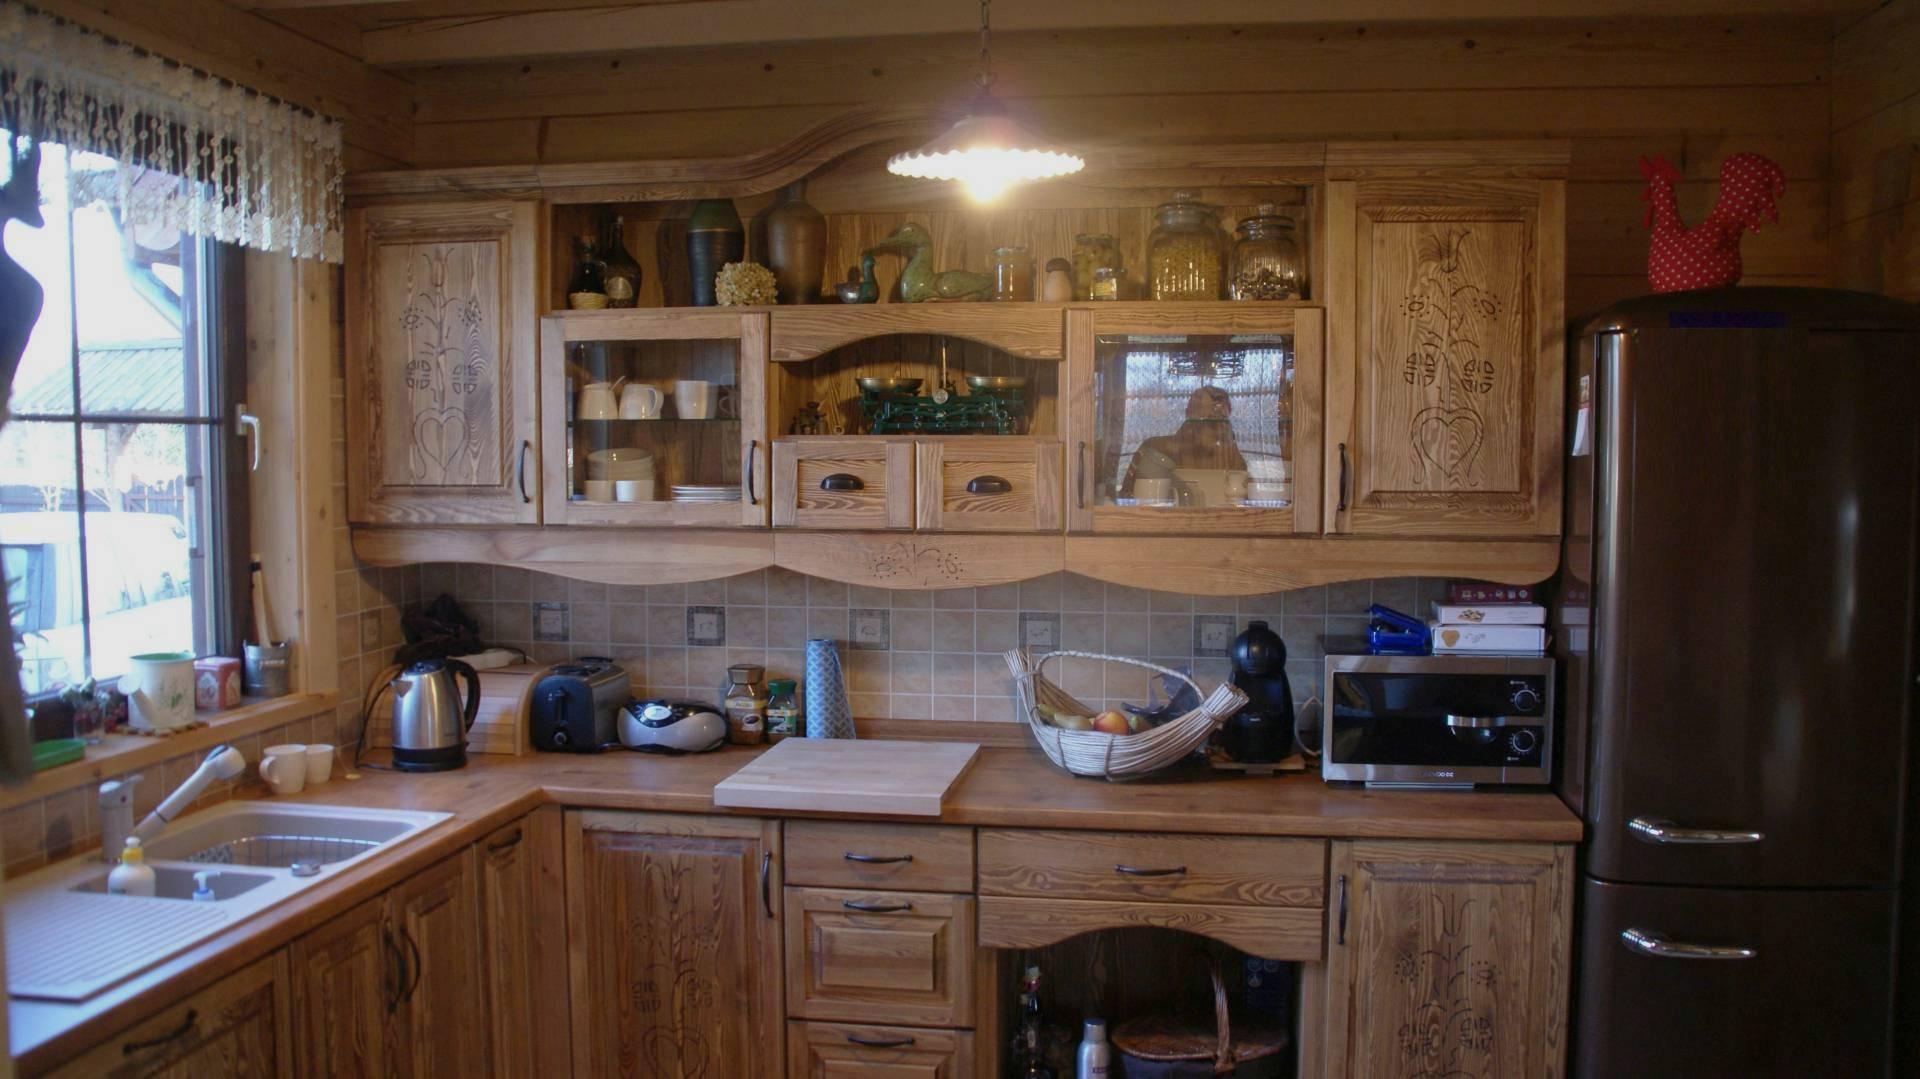 Rustykalna komoda, meble drewniane, biblioteka drewniana, kuchnia  Galeria  -> Kuchnie Rustykalne Bialystok